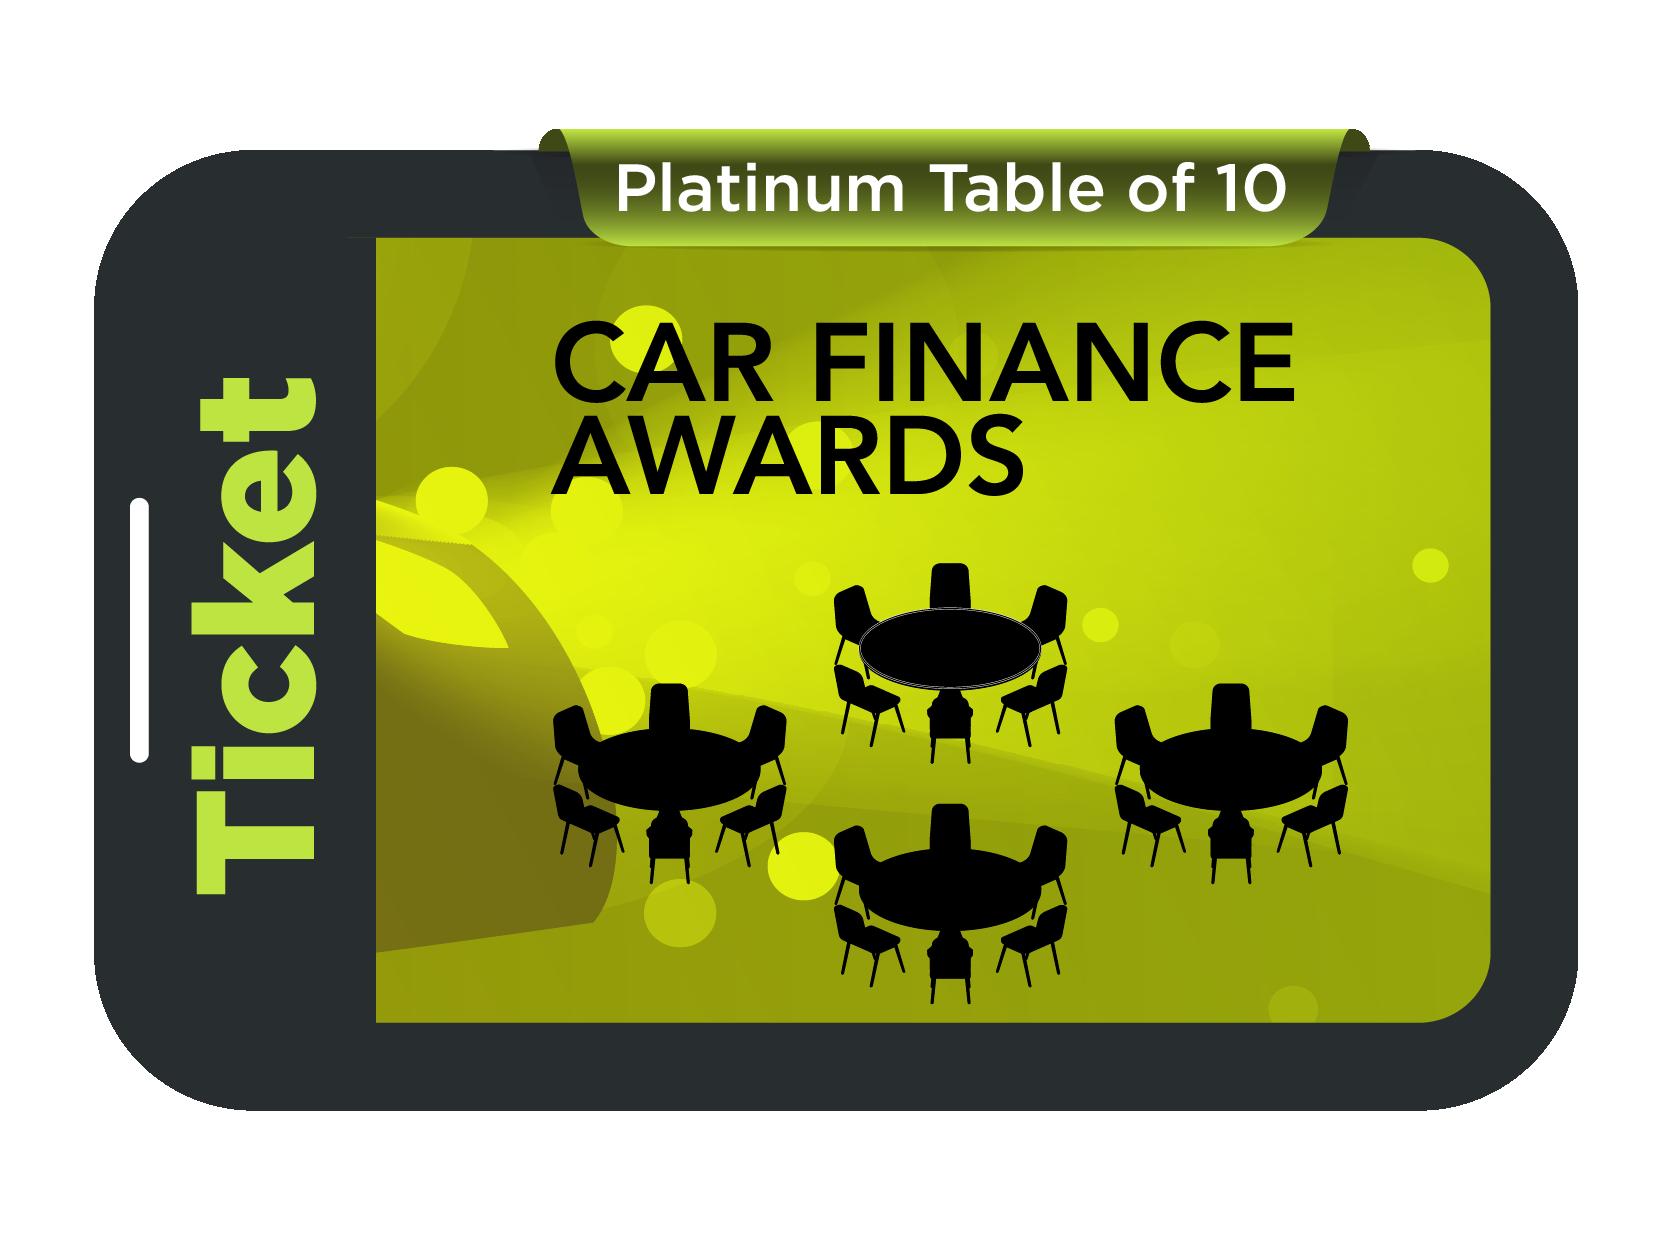 Platinum Table of 10 - Car Finance Awards 2021